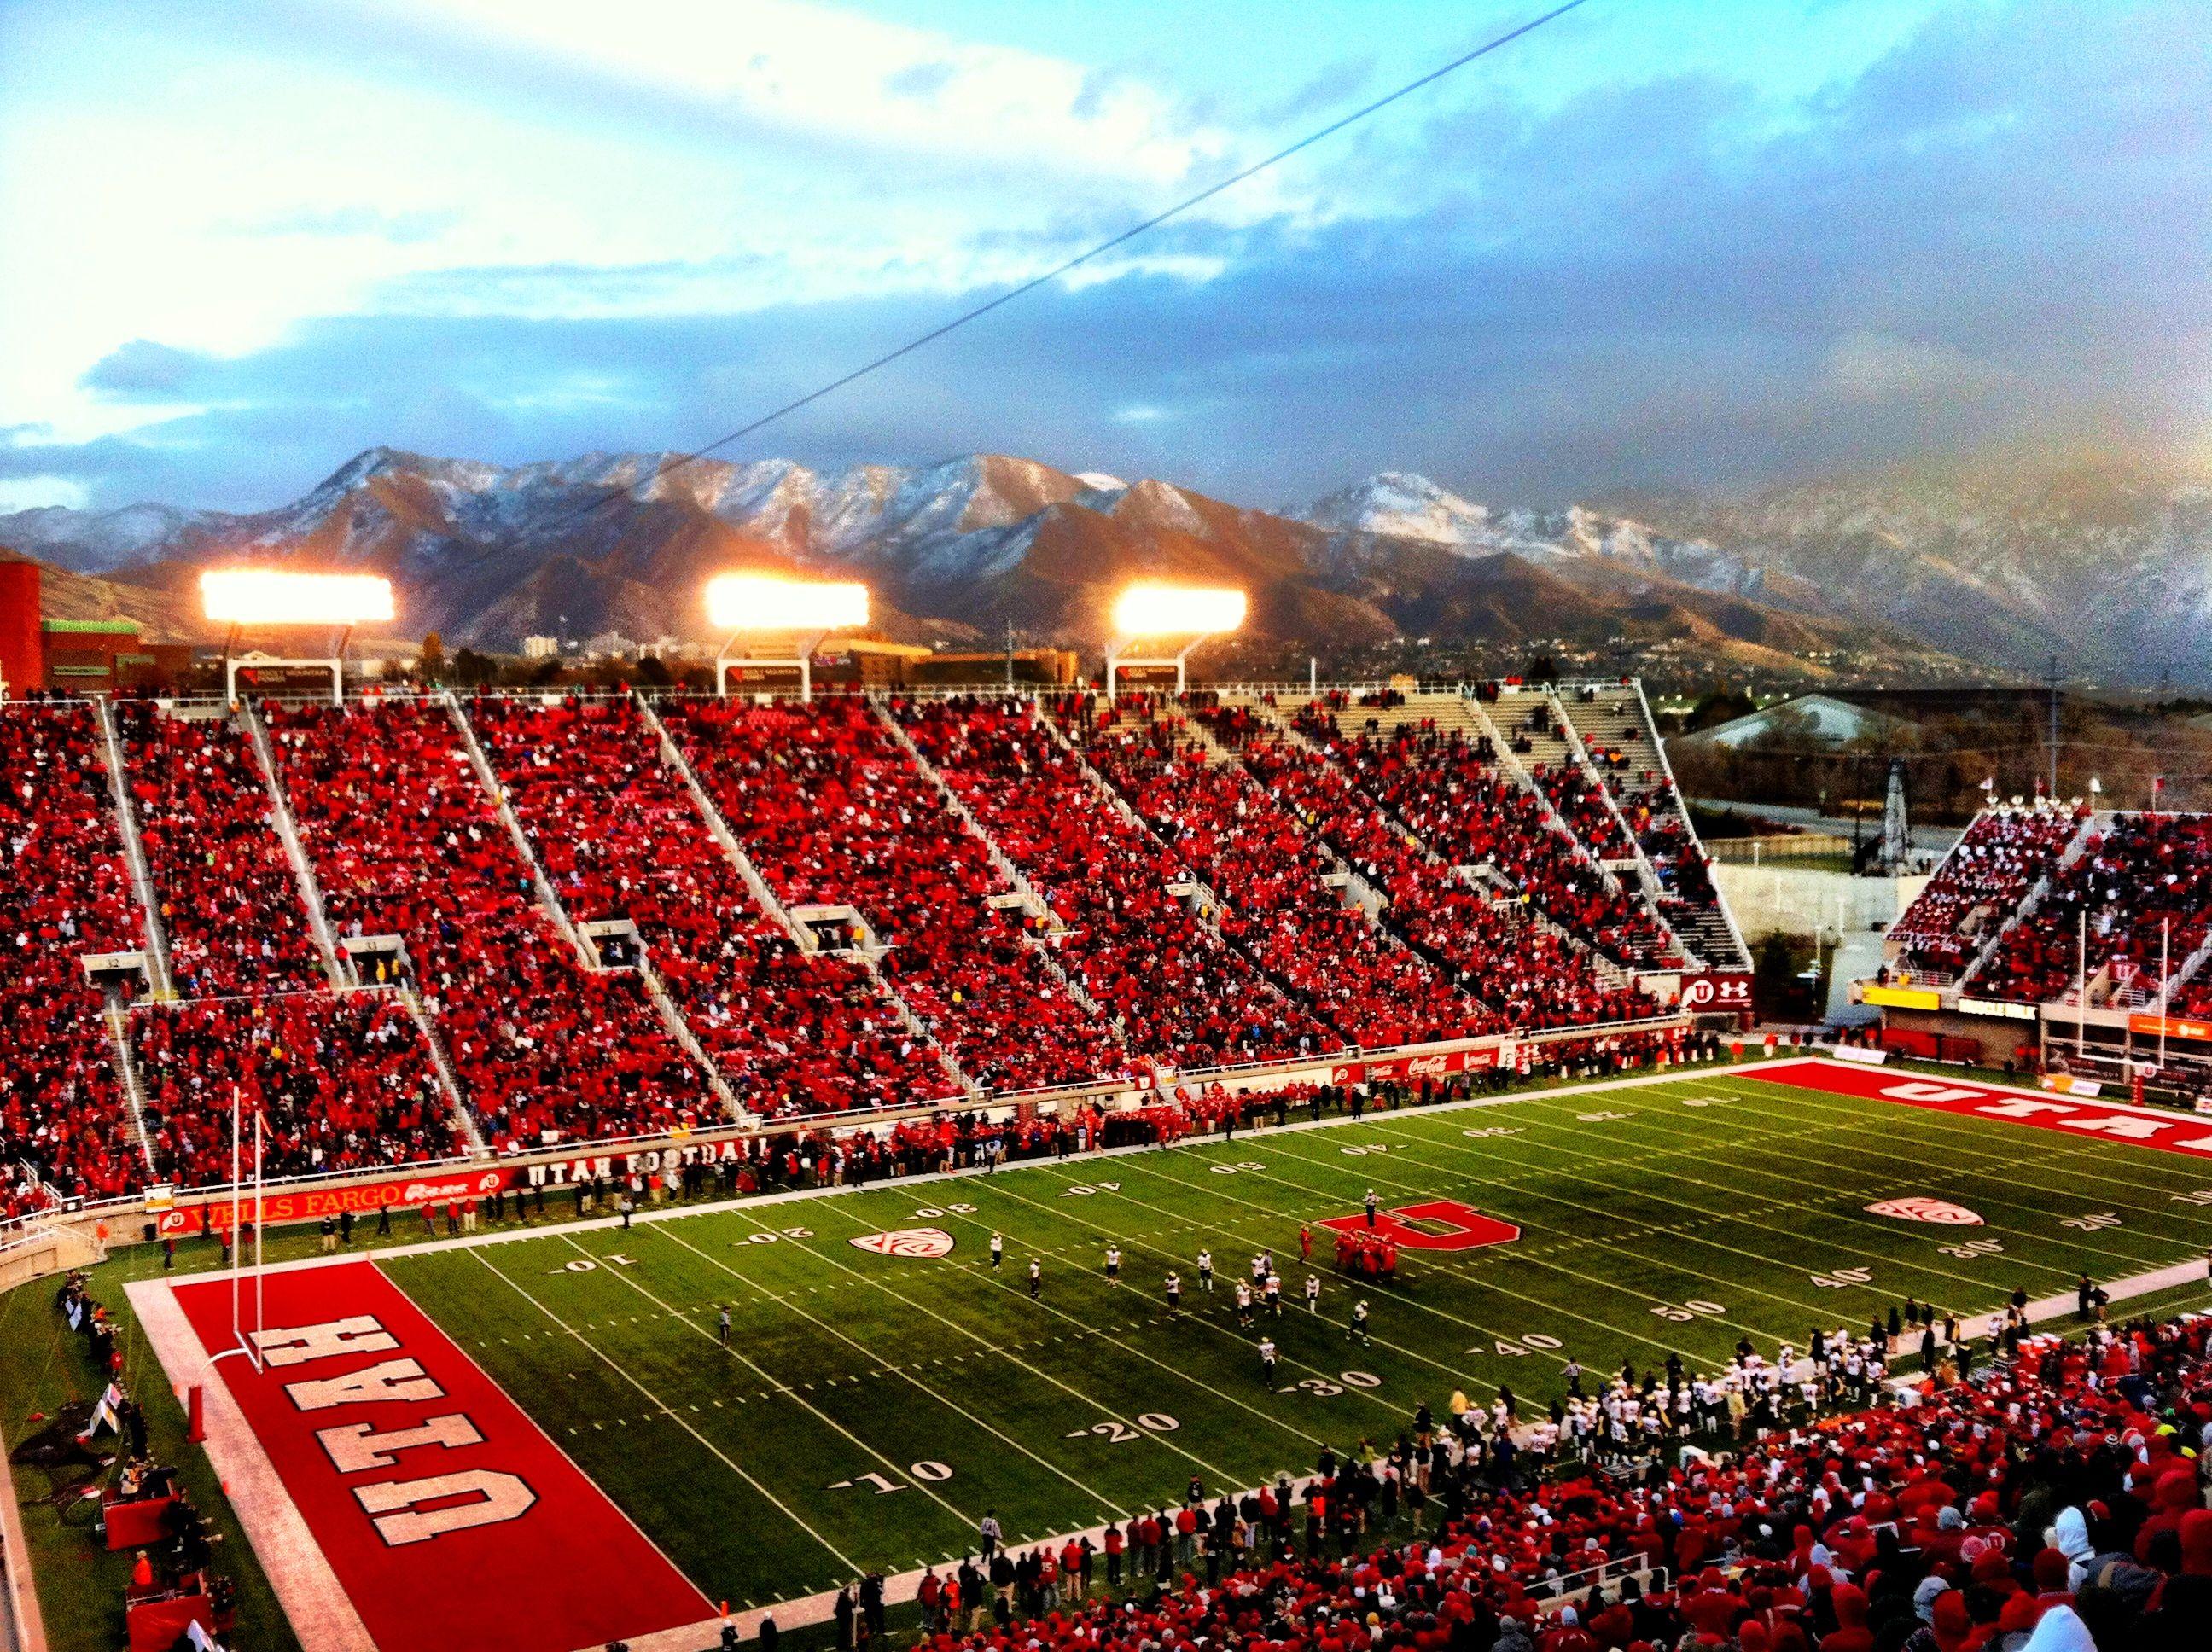 2014 University Of Utah Football Goutes Mark My Words Utah Utes Football University Of Utah Football University Of Utah